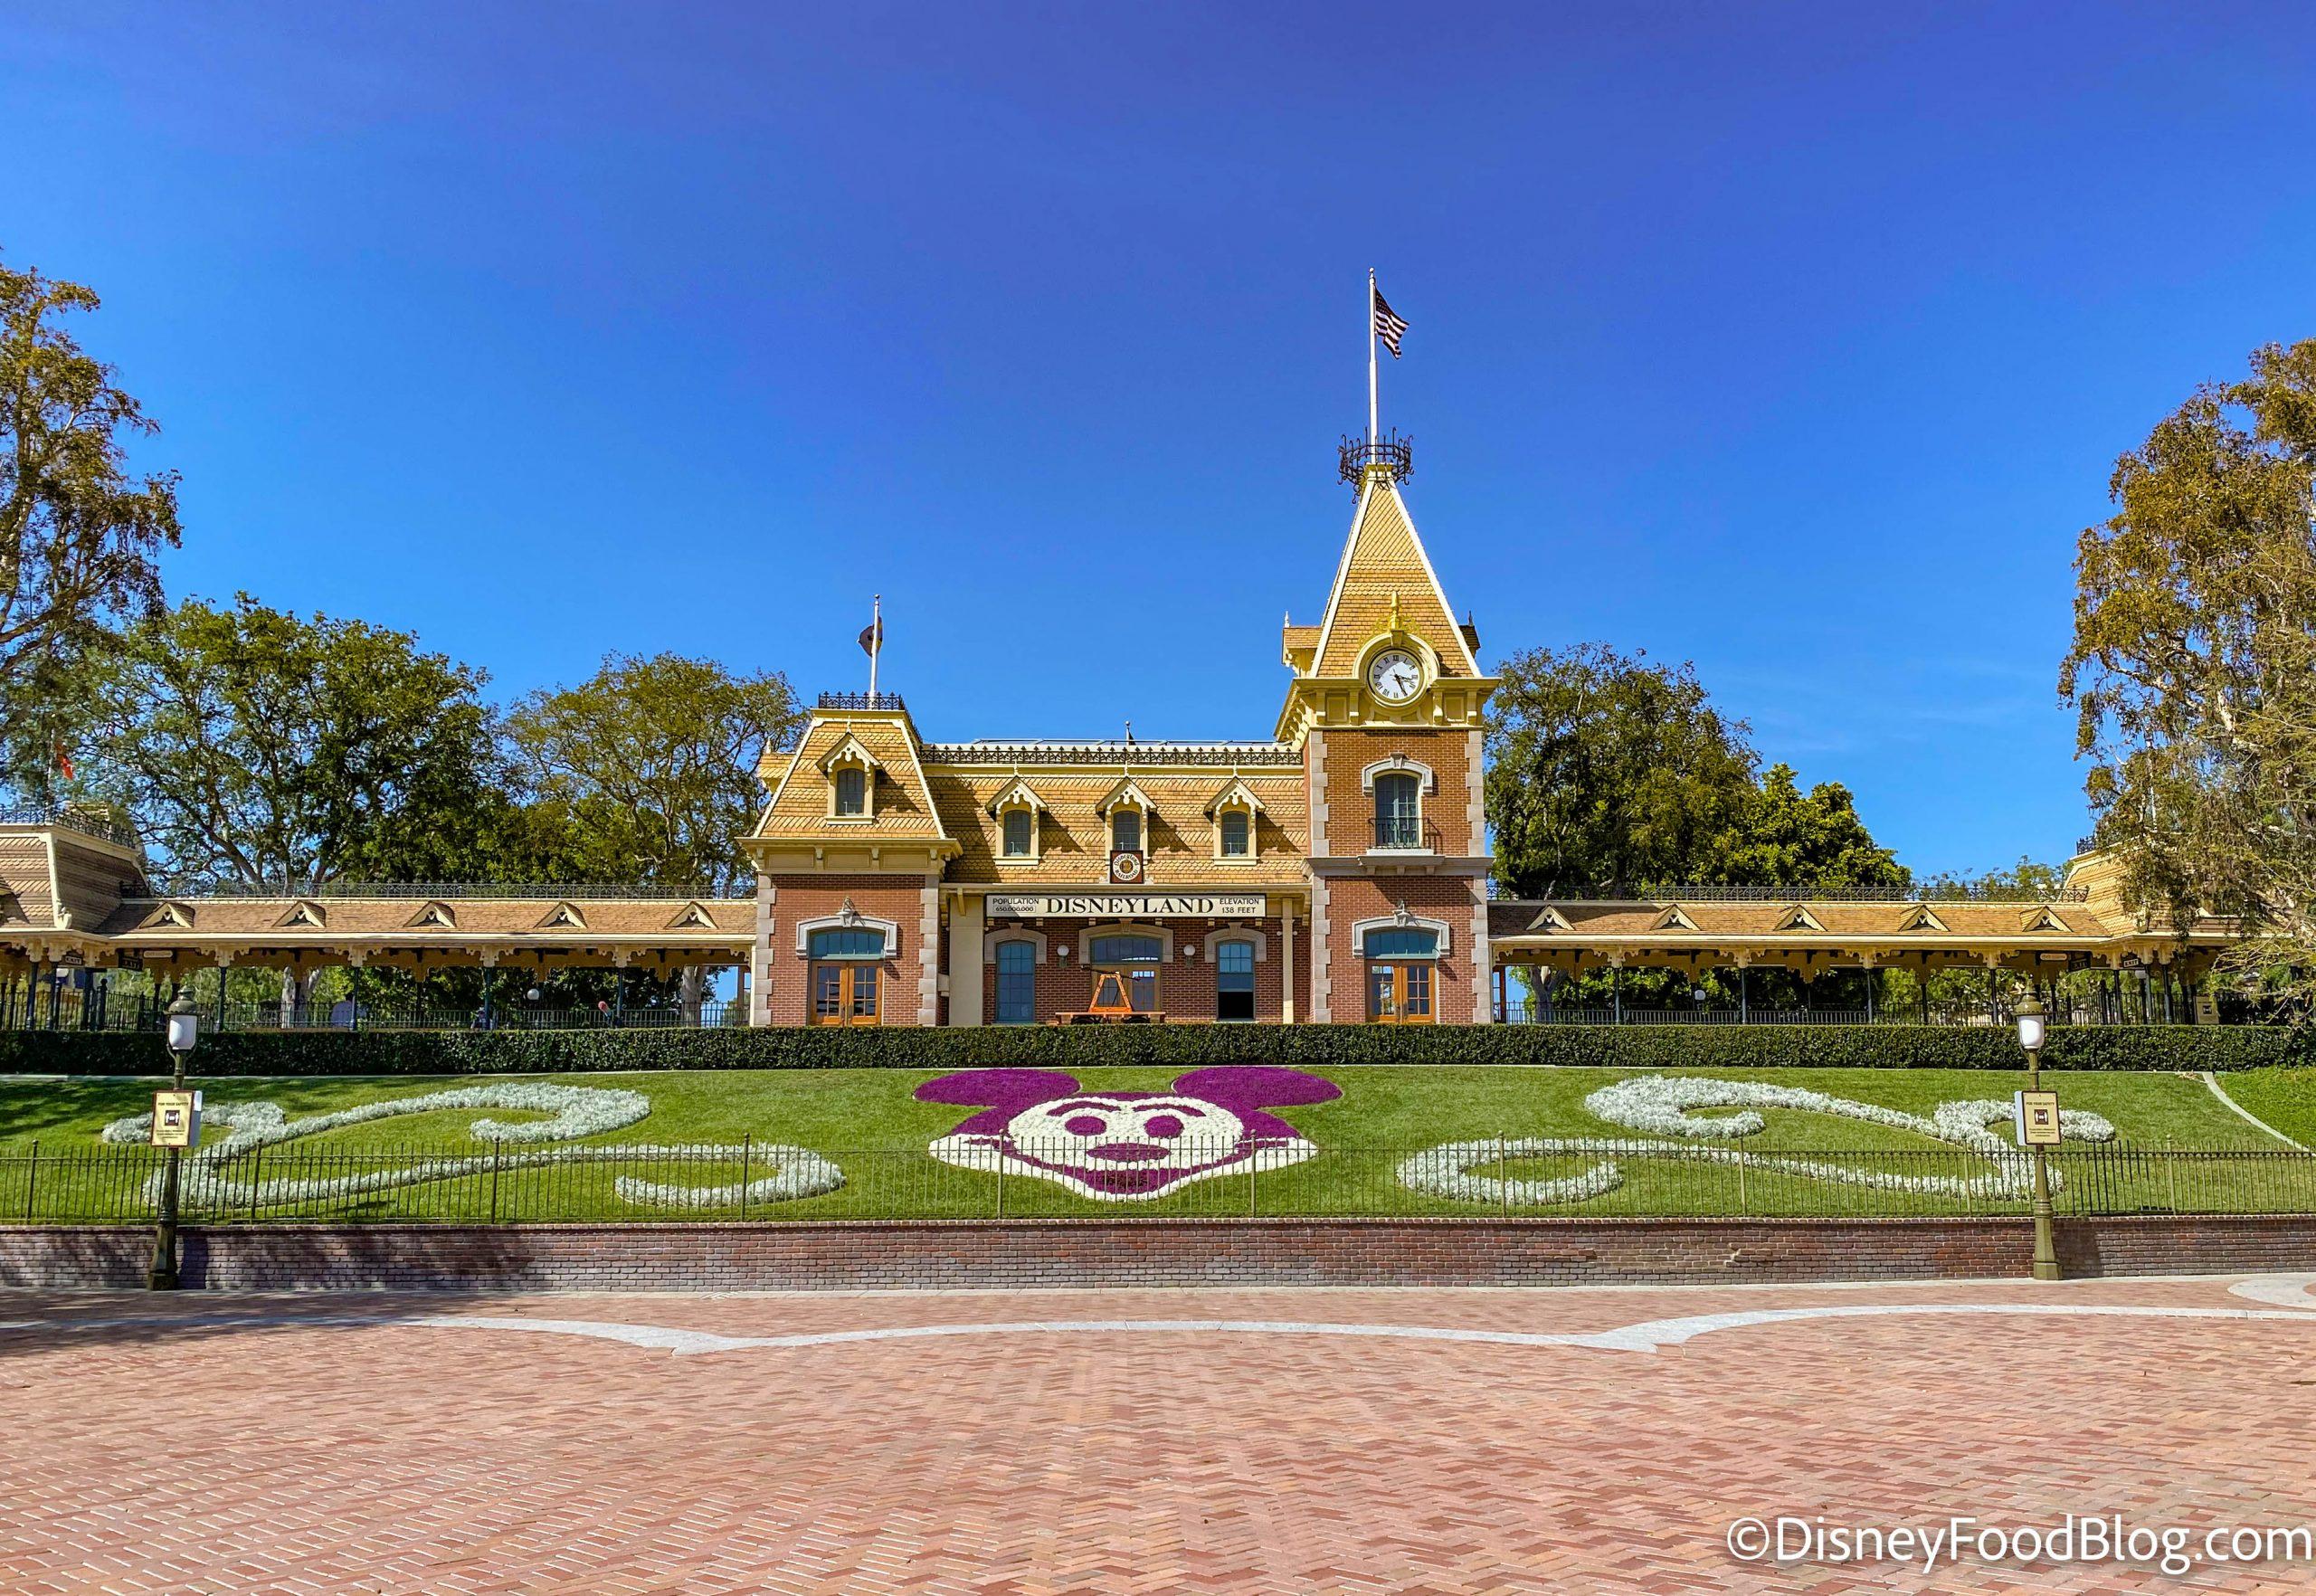 NEWS: Disneyland Could Increase Capacity SOON